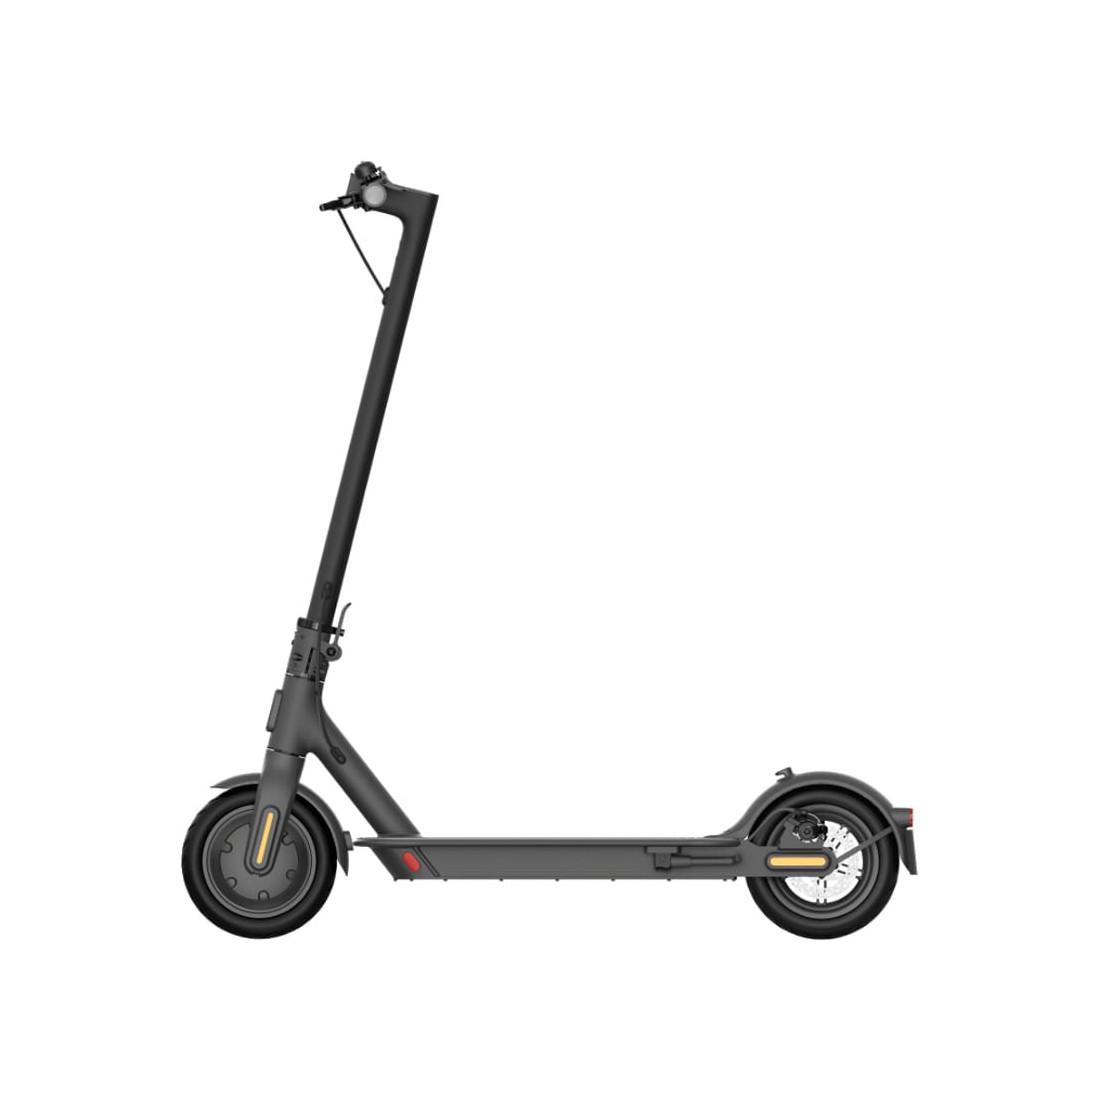 Электросамокат, Xiaomi, MiJia Smart Electric Scooter Essential FBC4022GL, Черный - фото 2